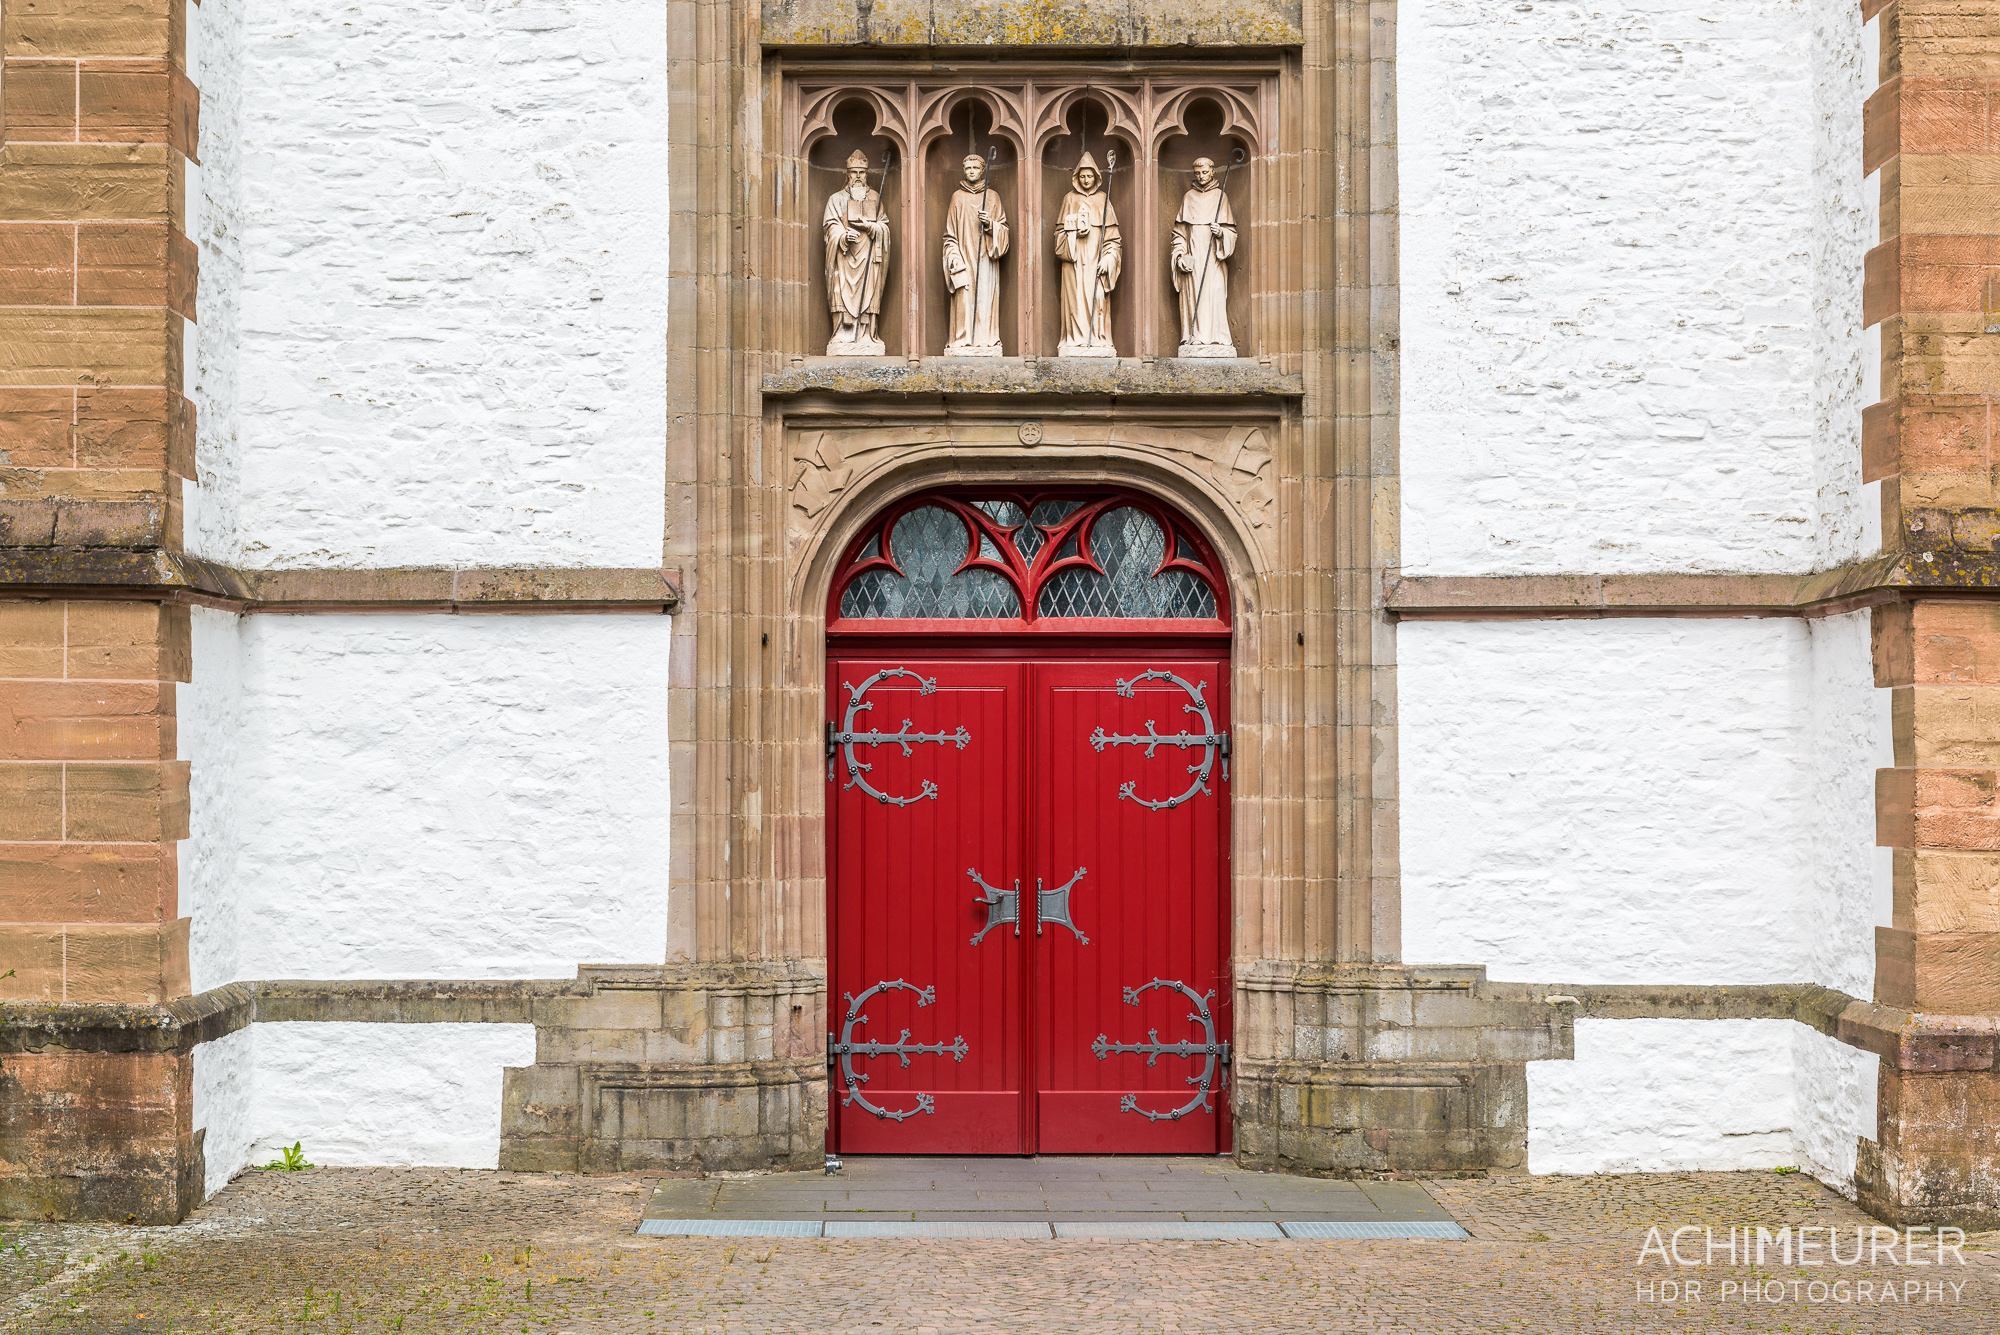 Eifel-Rheinland-Pfalz-Rureifel_5399